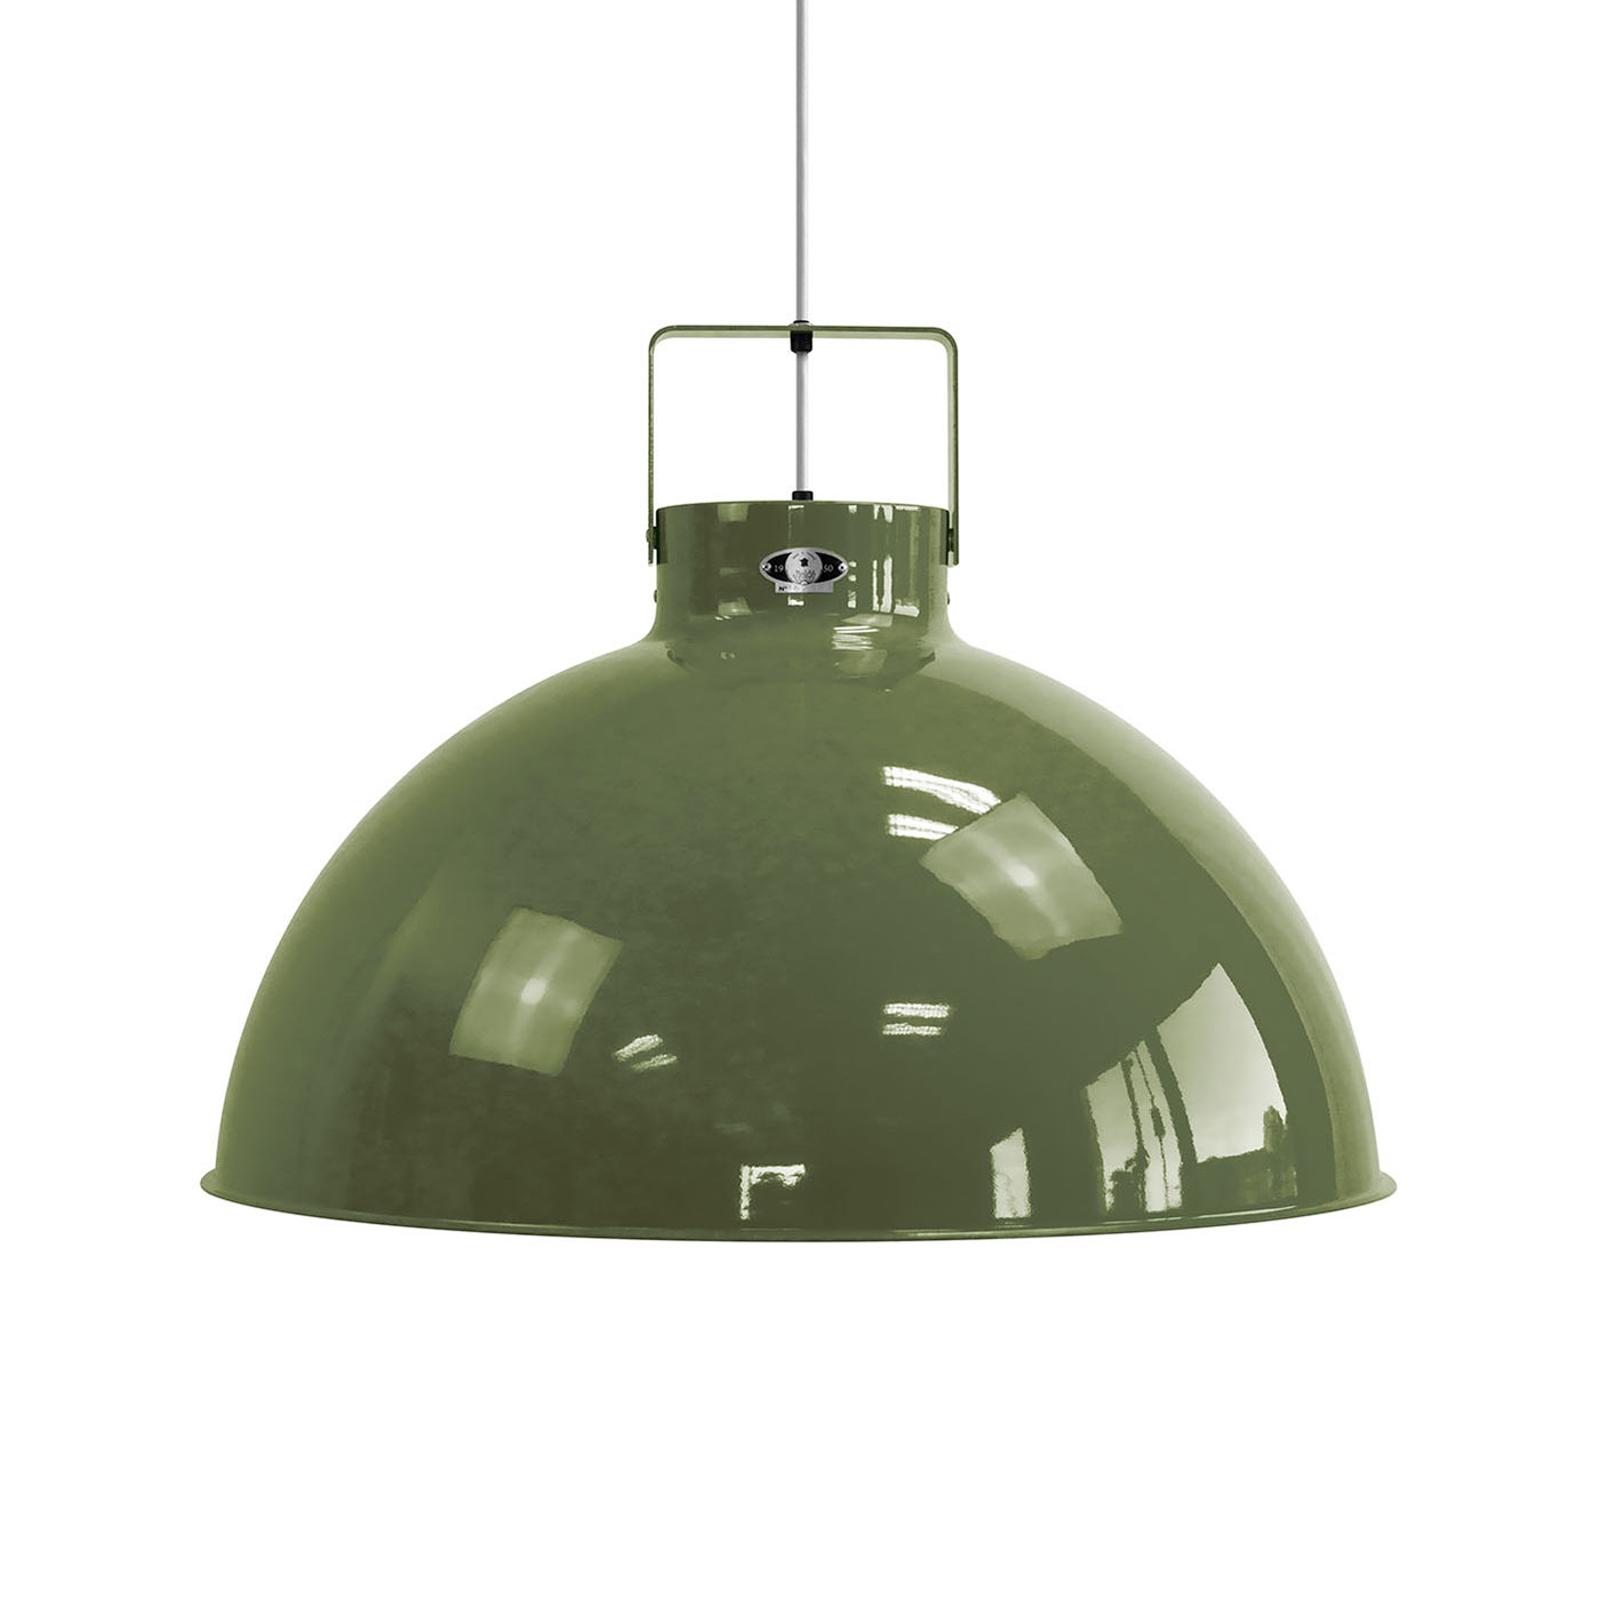 Jieldé Dante D675 lampa wisząca, oliwkowa, Ø67,5cm